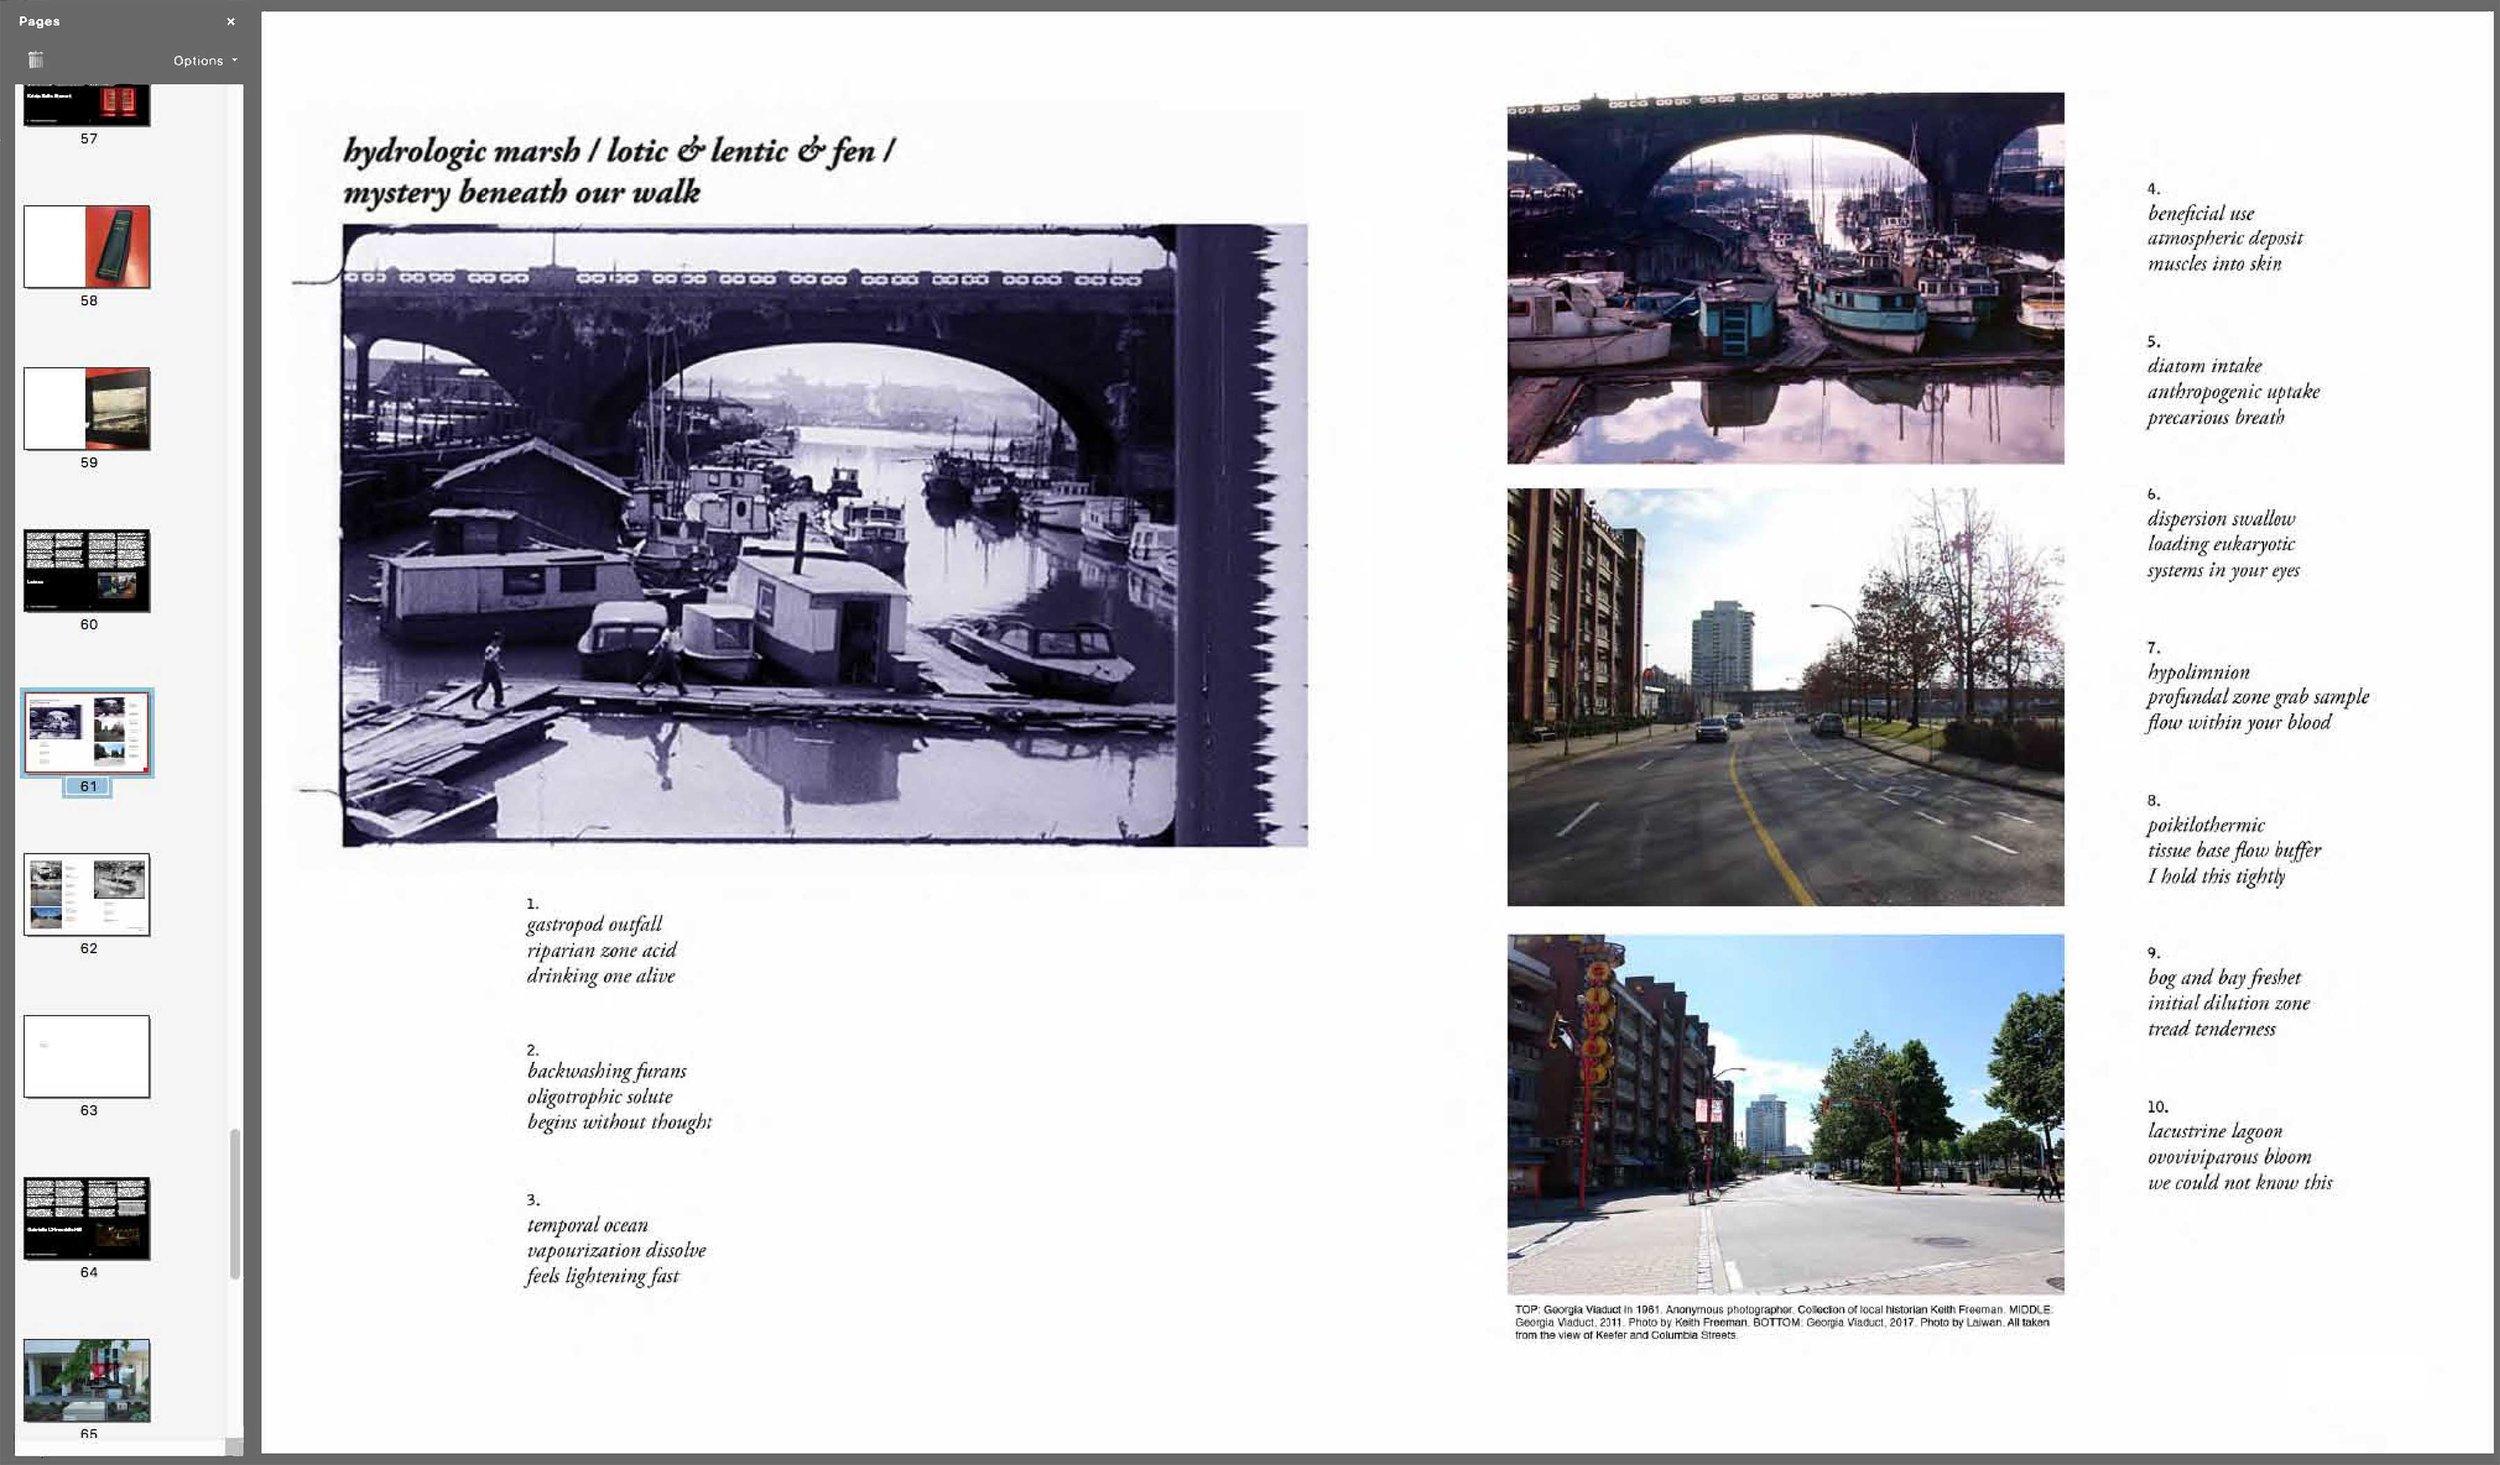 Laiwan-NEFC-Public-Art-Plan-Pg2.jpg